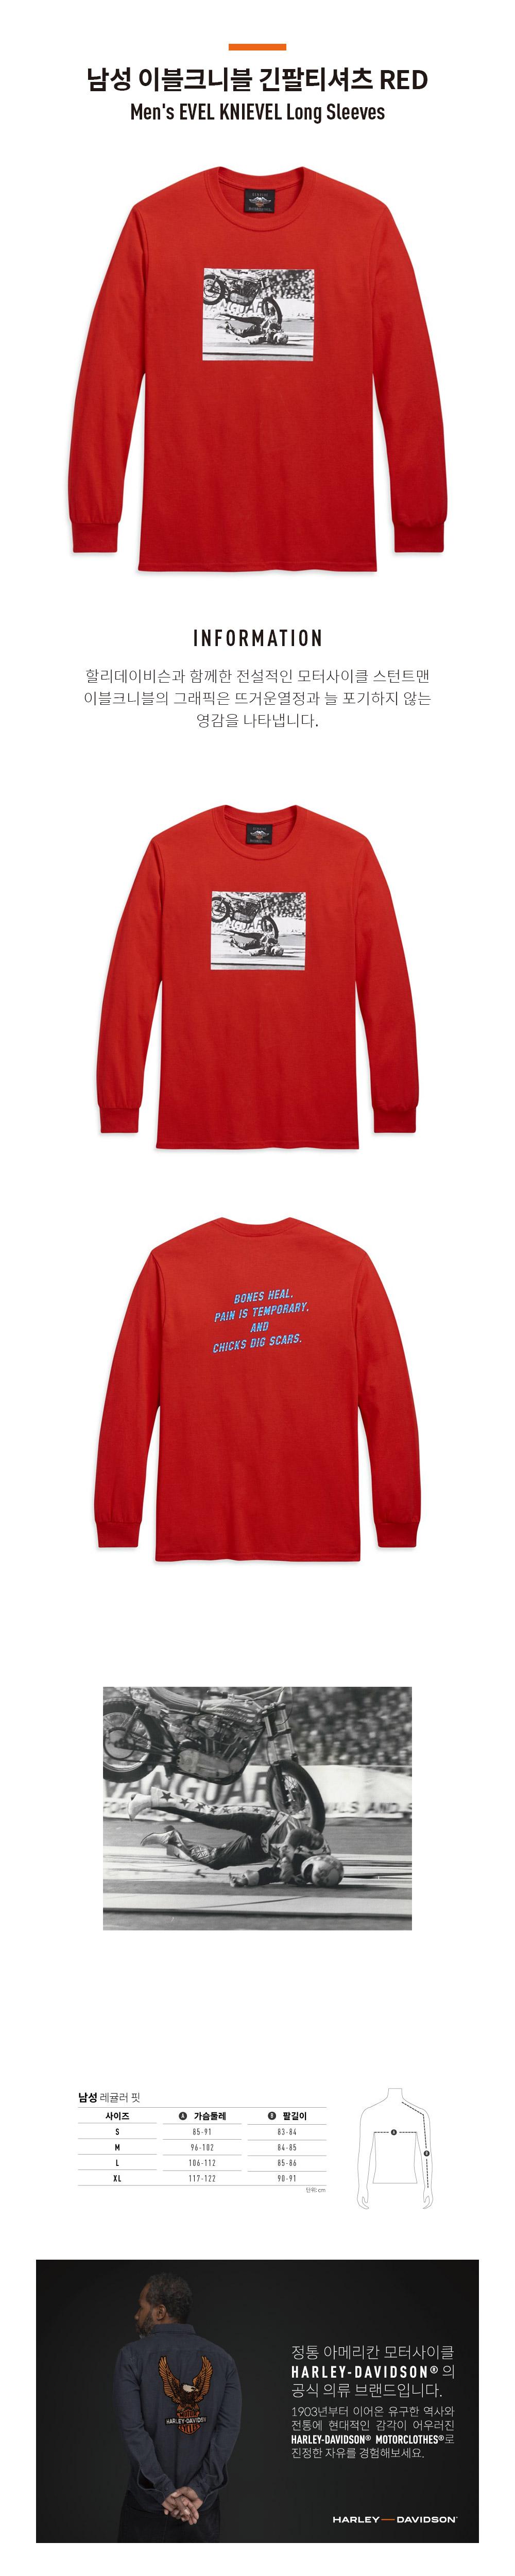 [LIMITED] 남성 이블크니블 긴팔티셔츠 RED